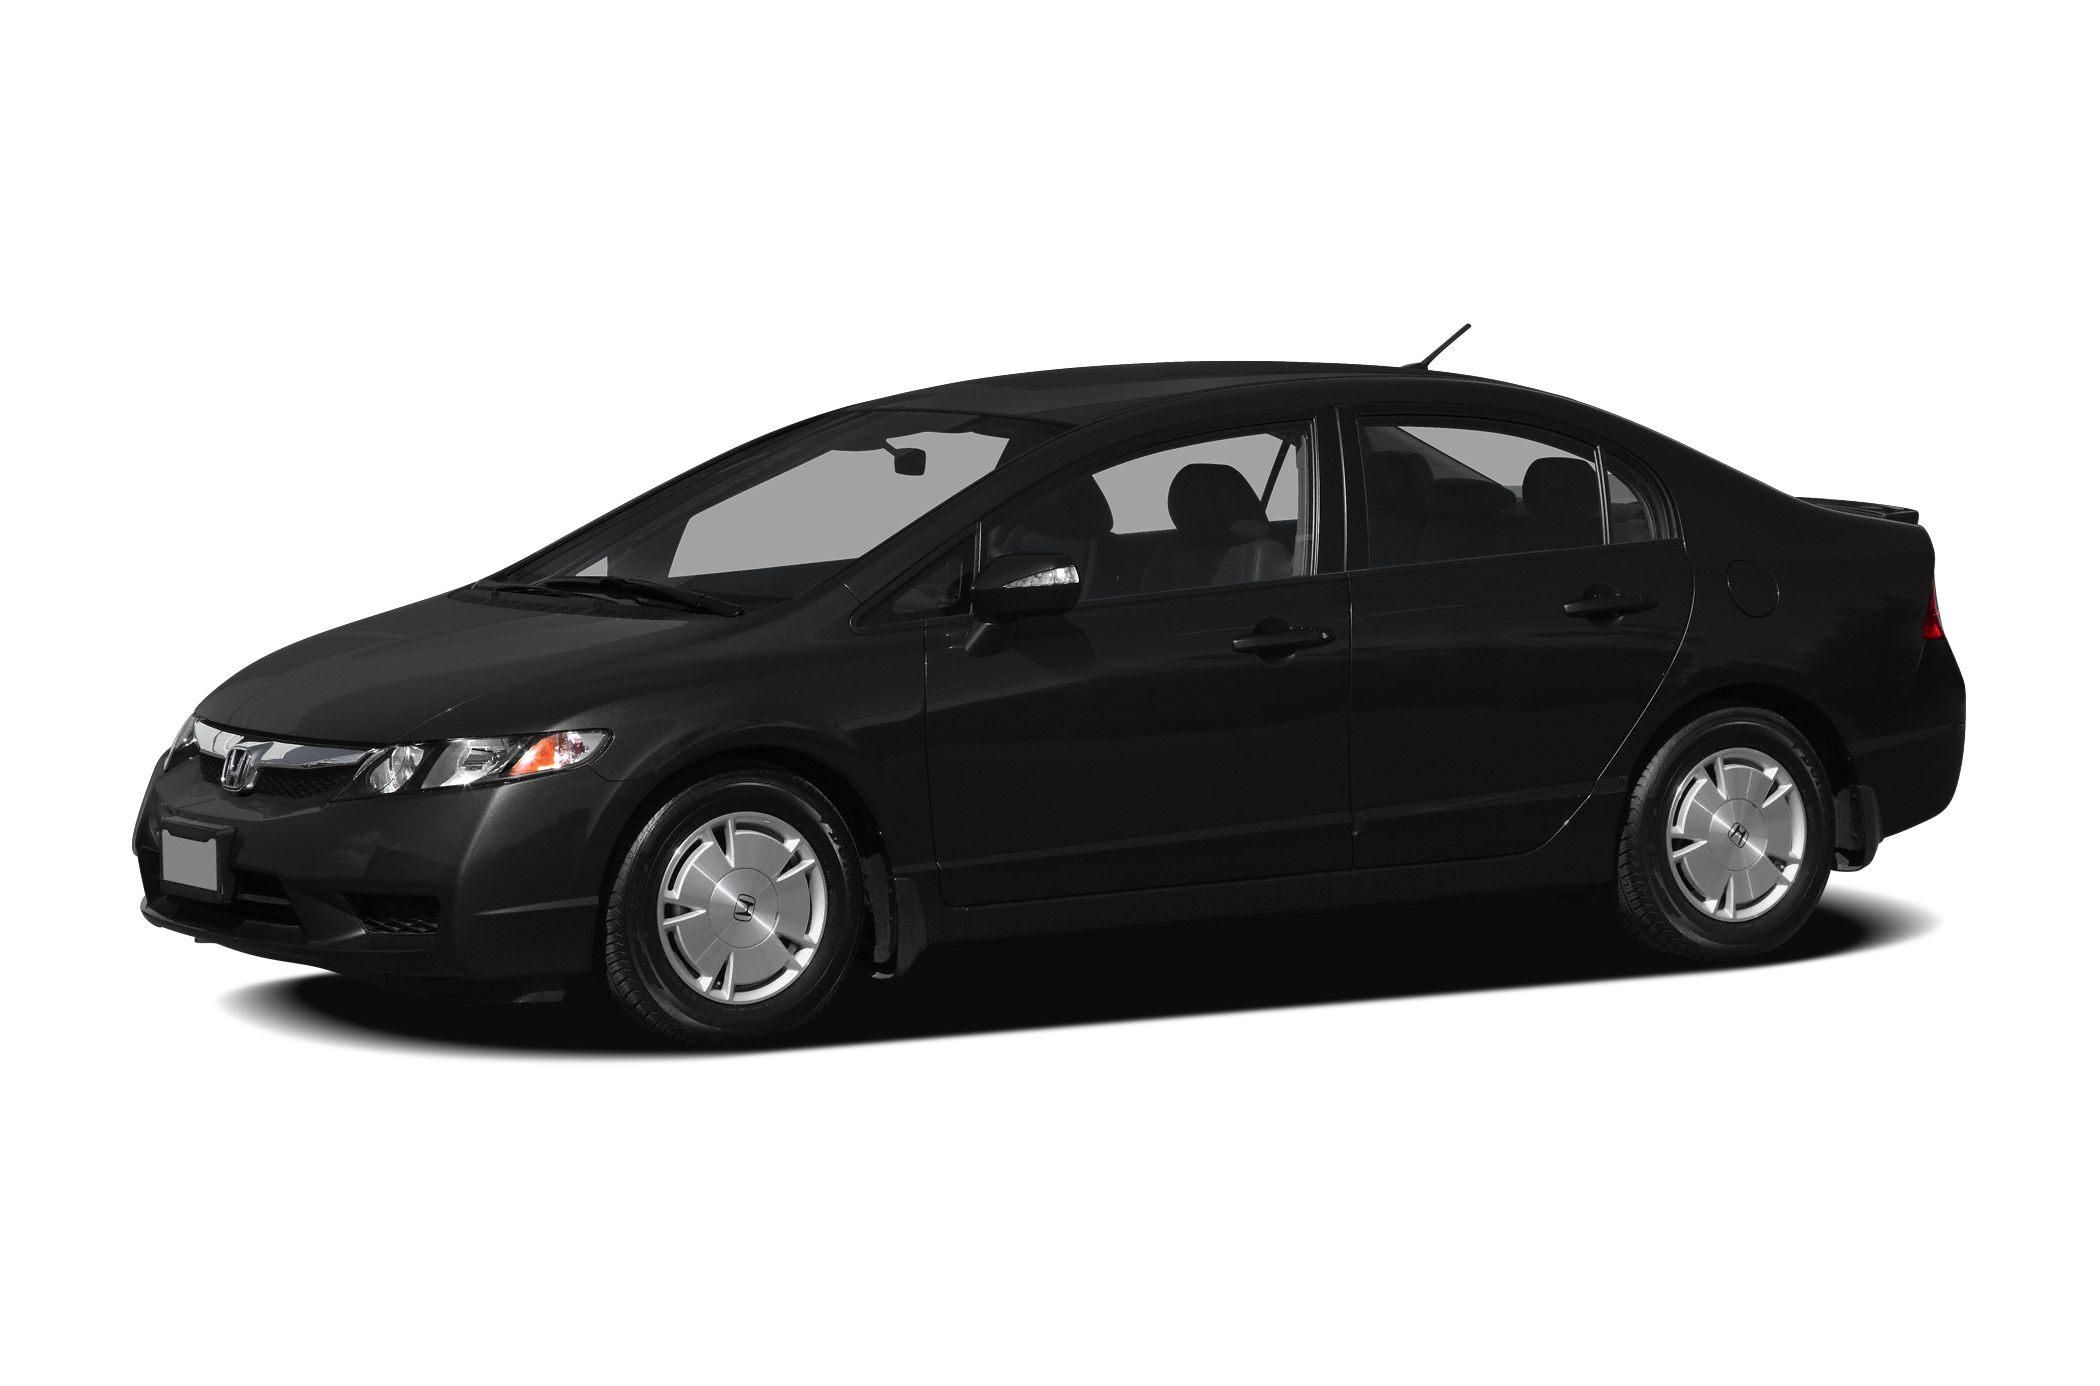 2009 Honda Civic Hybrid Base LOW MILES - 63874 FUEL EFFICIENT 45 MPG Hwy40 MPG City Civic trim